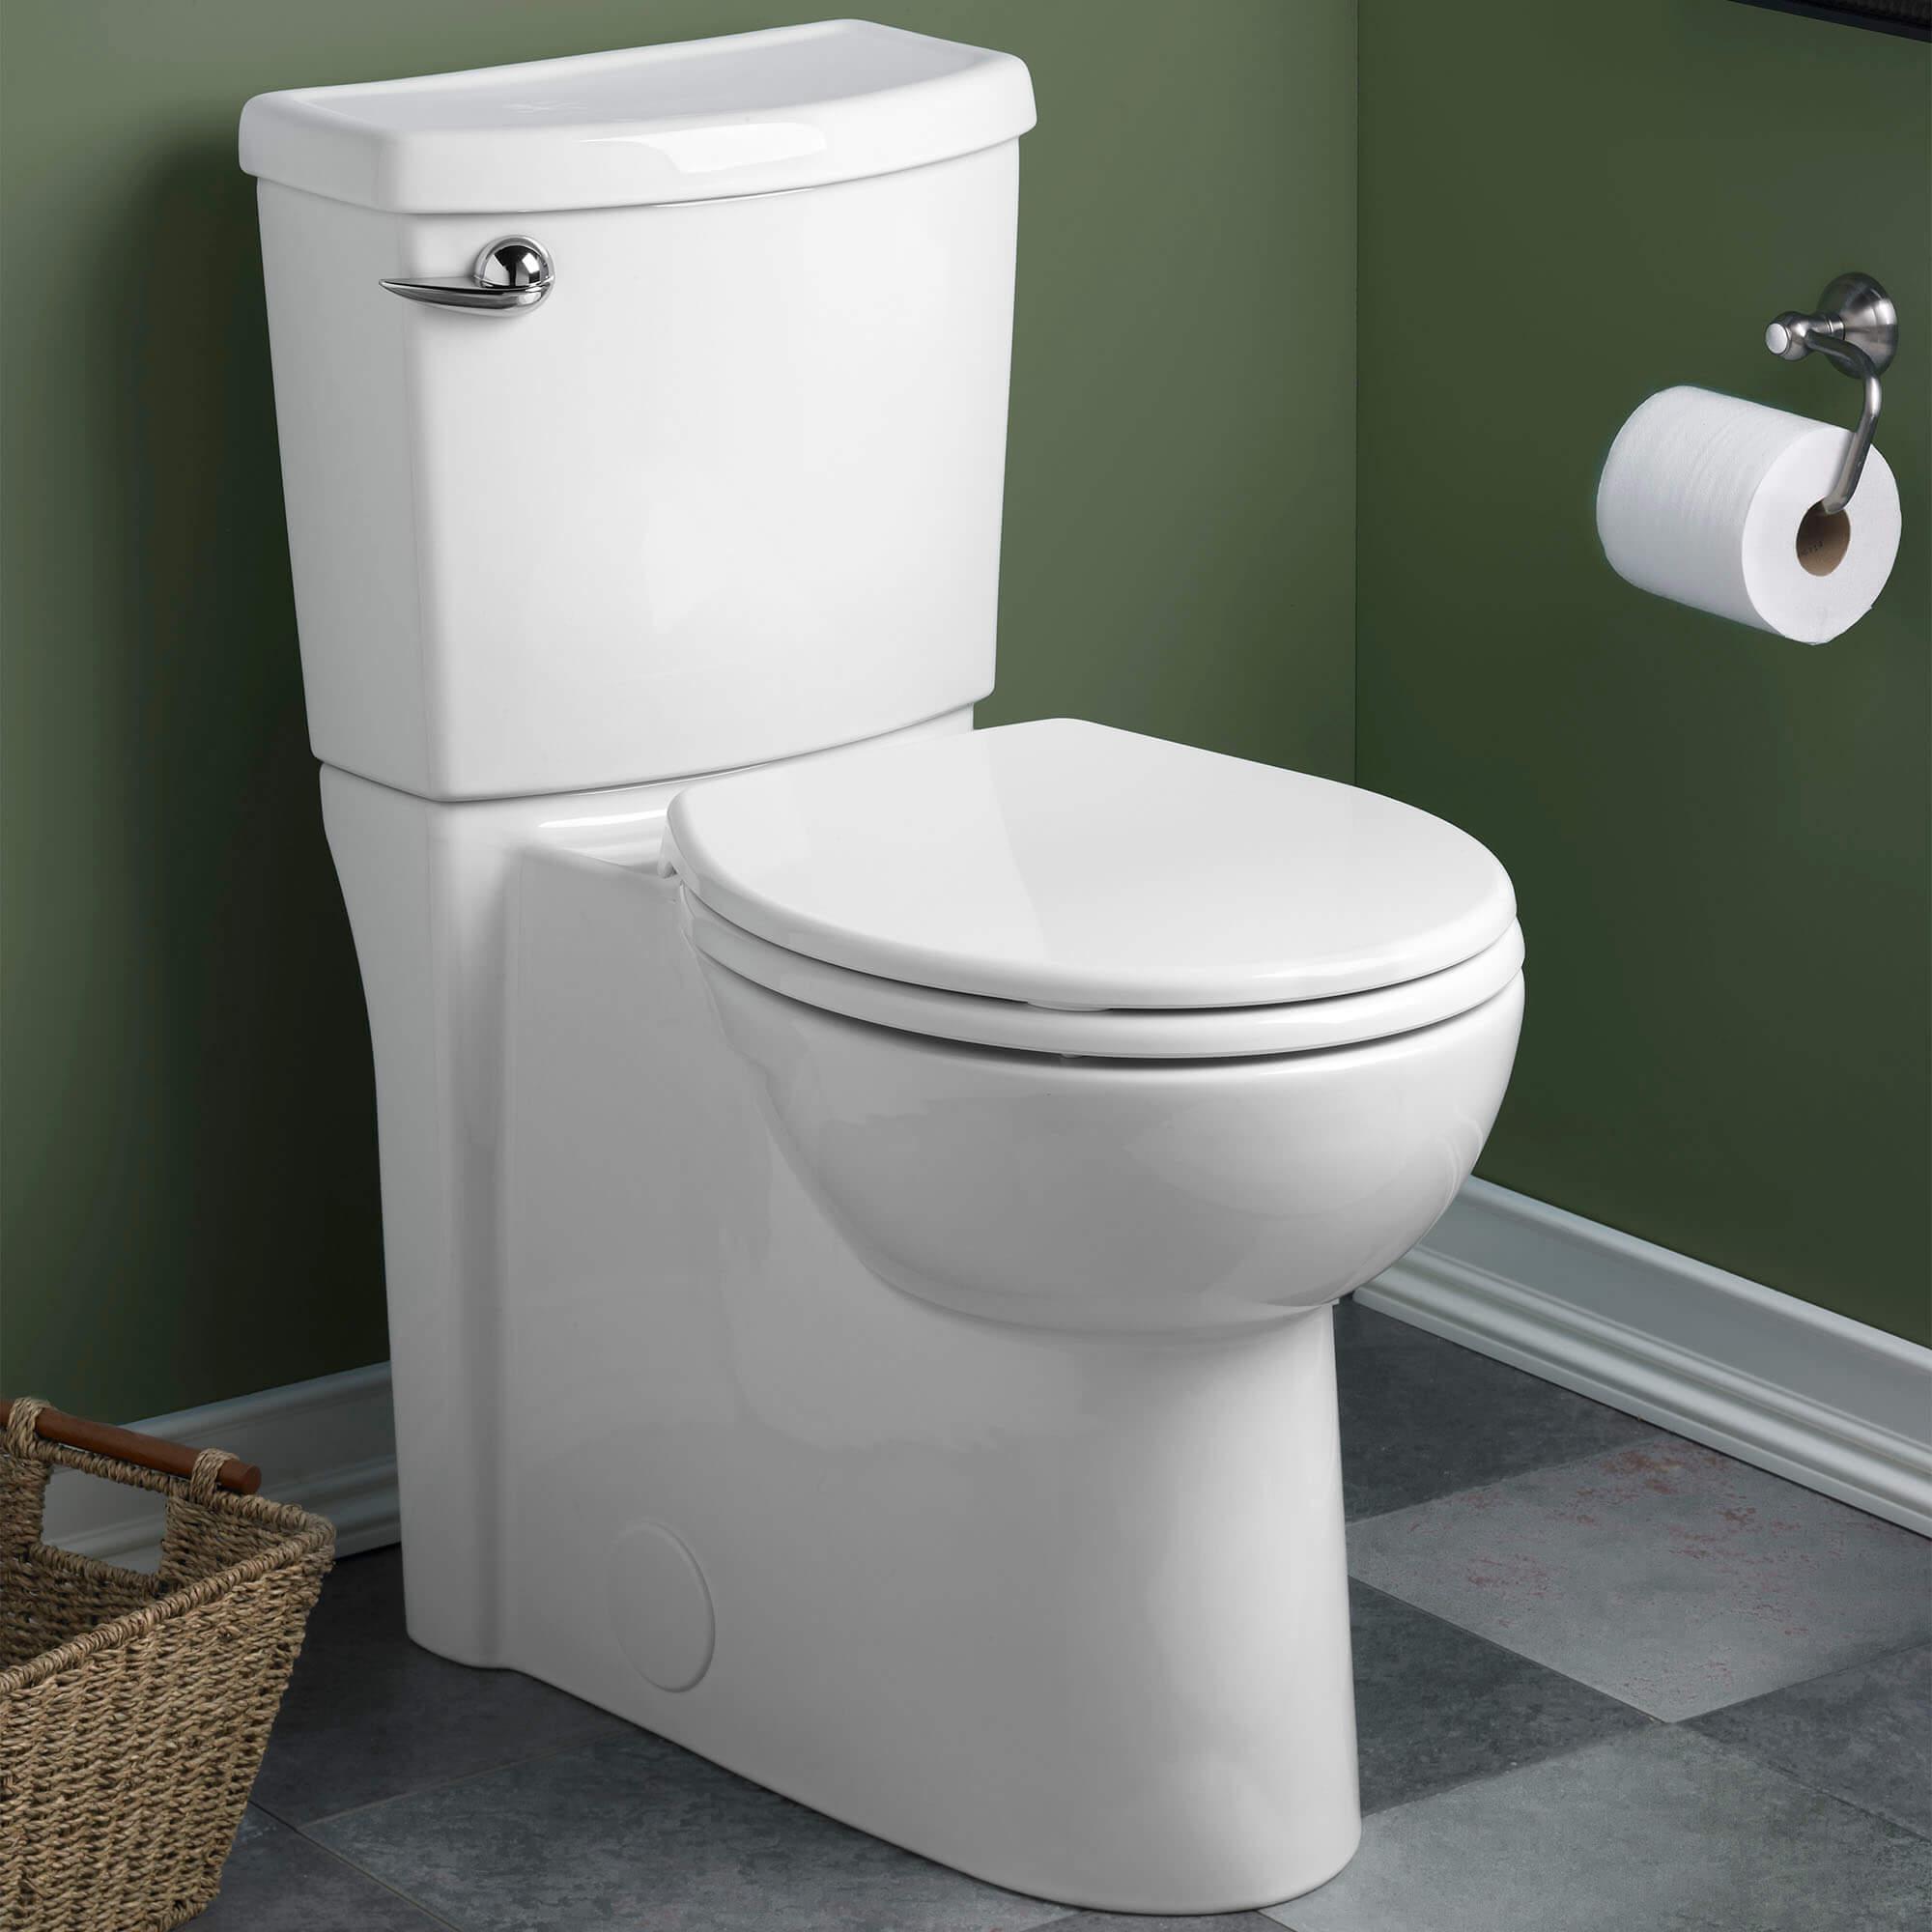 Cadet 3 Toilet